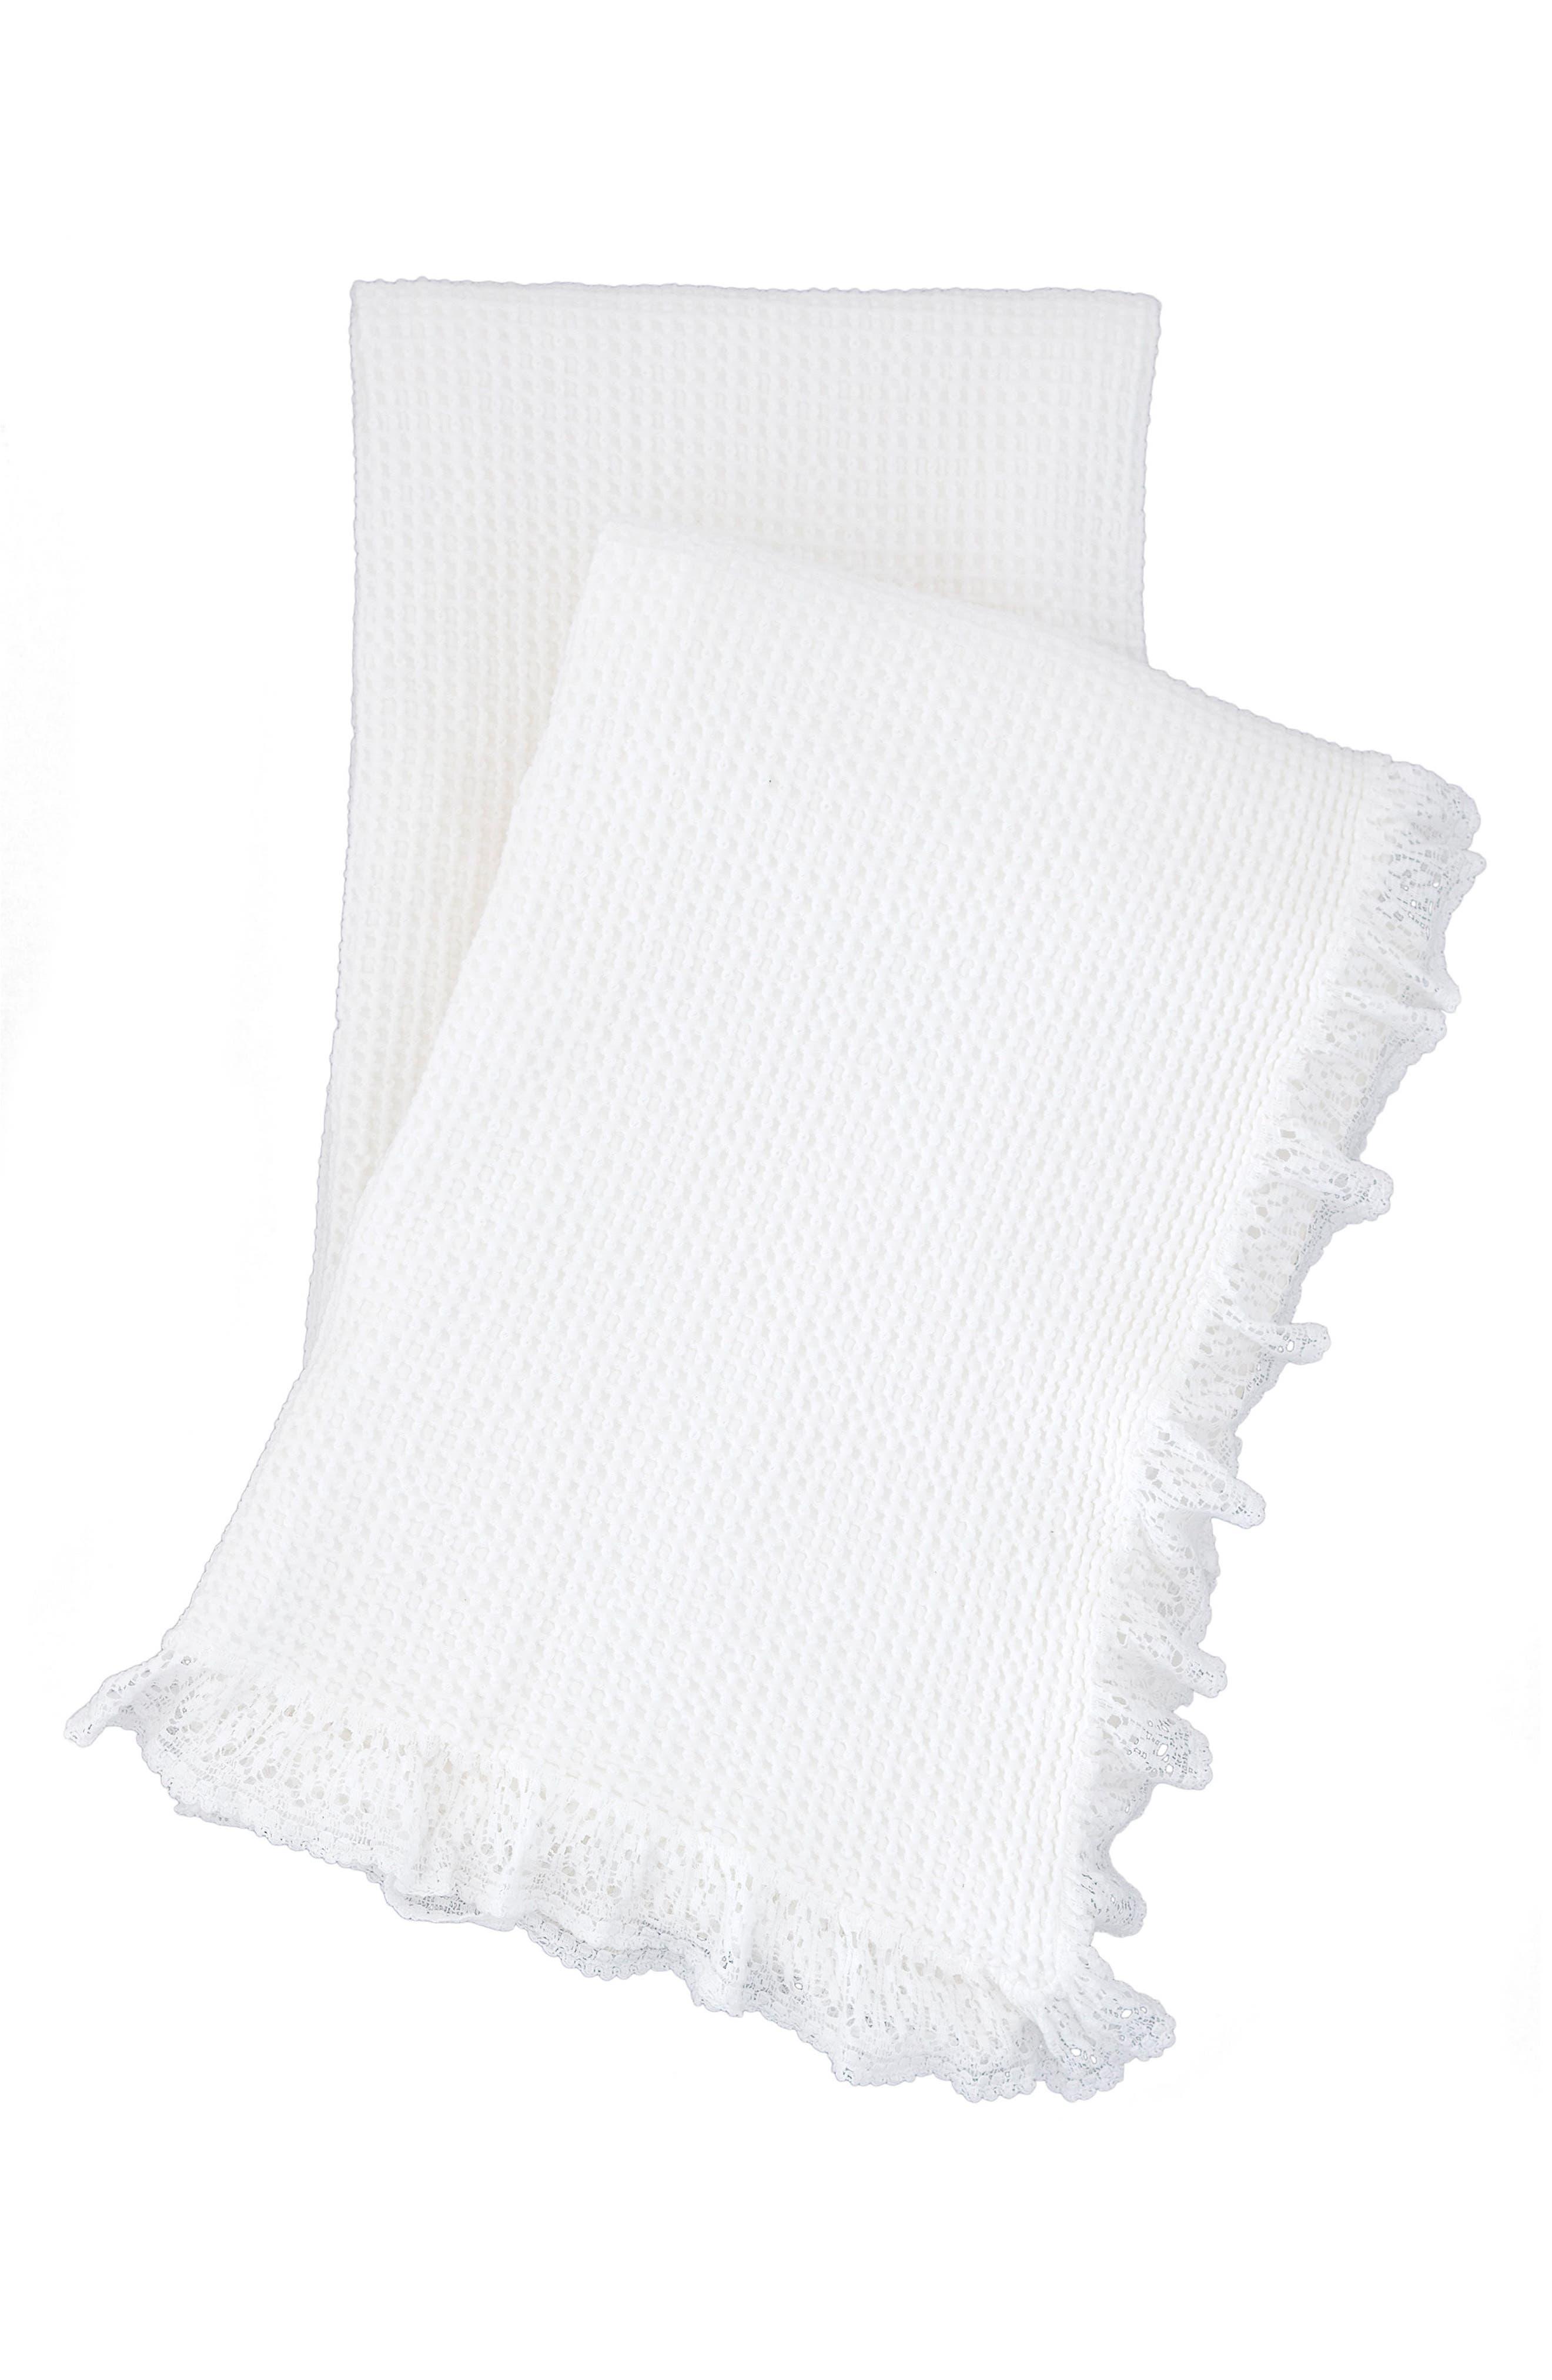 Lace Ruffle Throw,                             Main thumbnail 1, color,                             WHITE